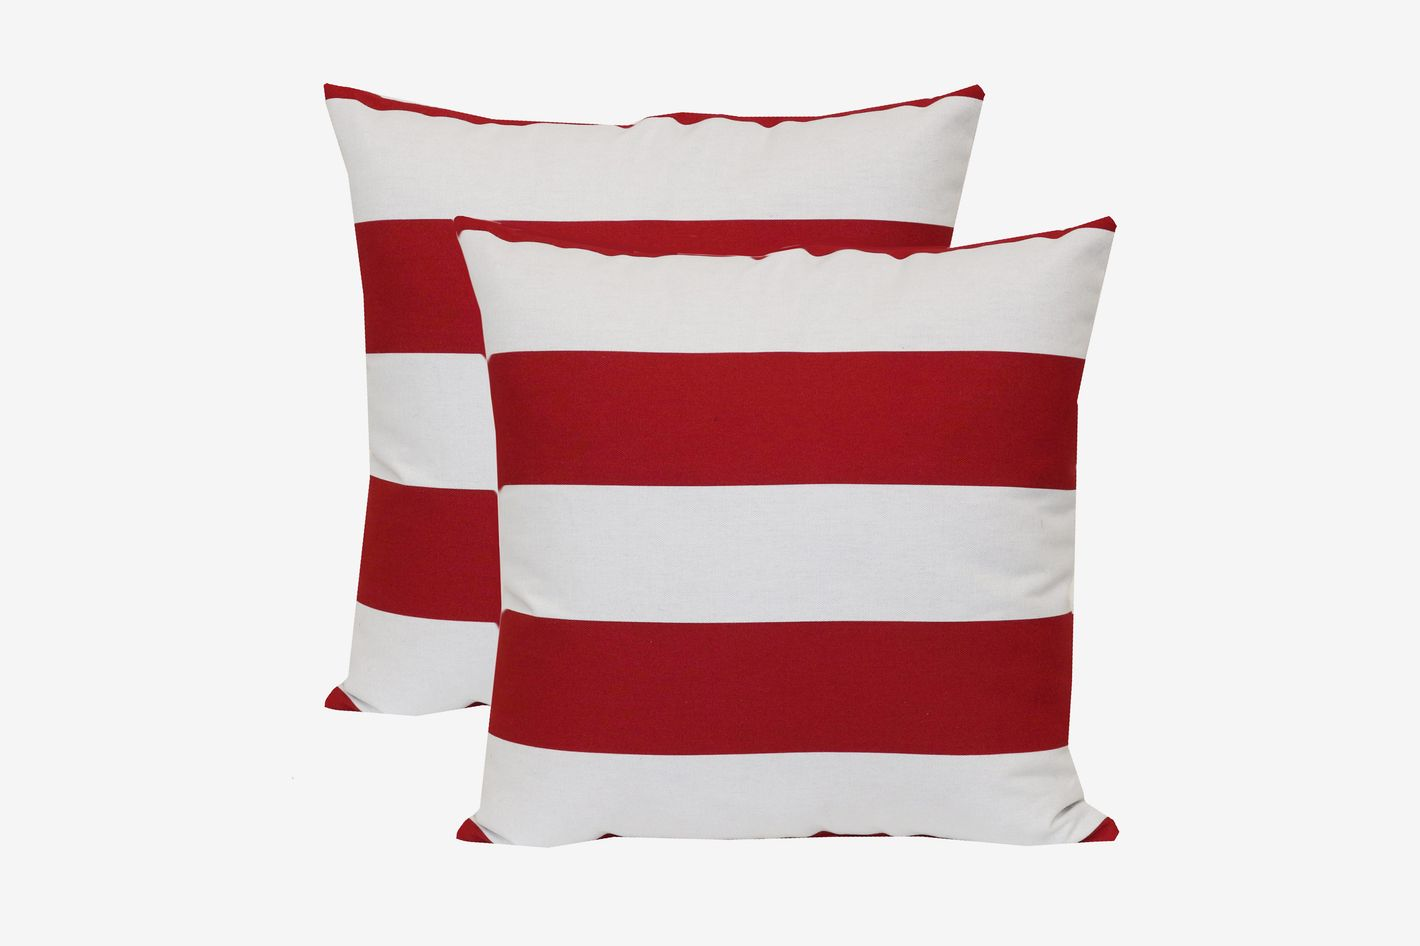 Mainstays Balboa Striped Outdoor Toss Pillow, Set of 2